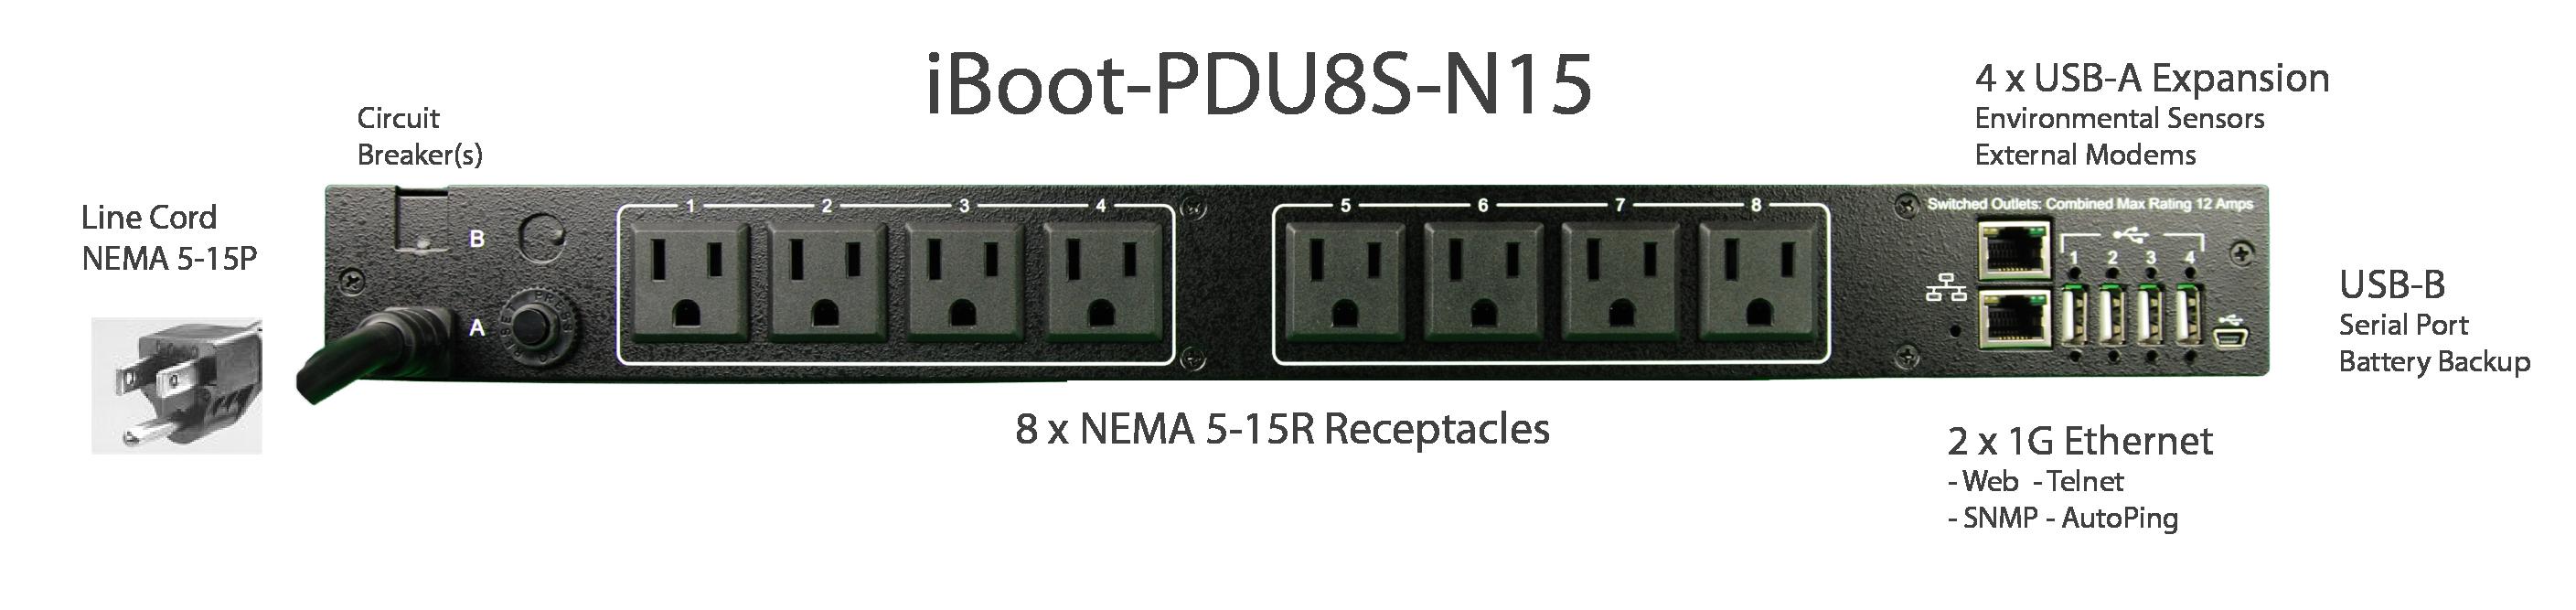 iBoot-PDU8S-N15 for Remote Reboot, 1 x NEMA 5-15P.